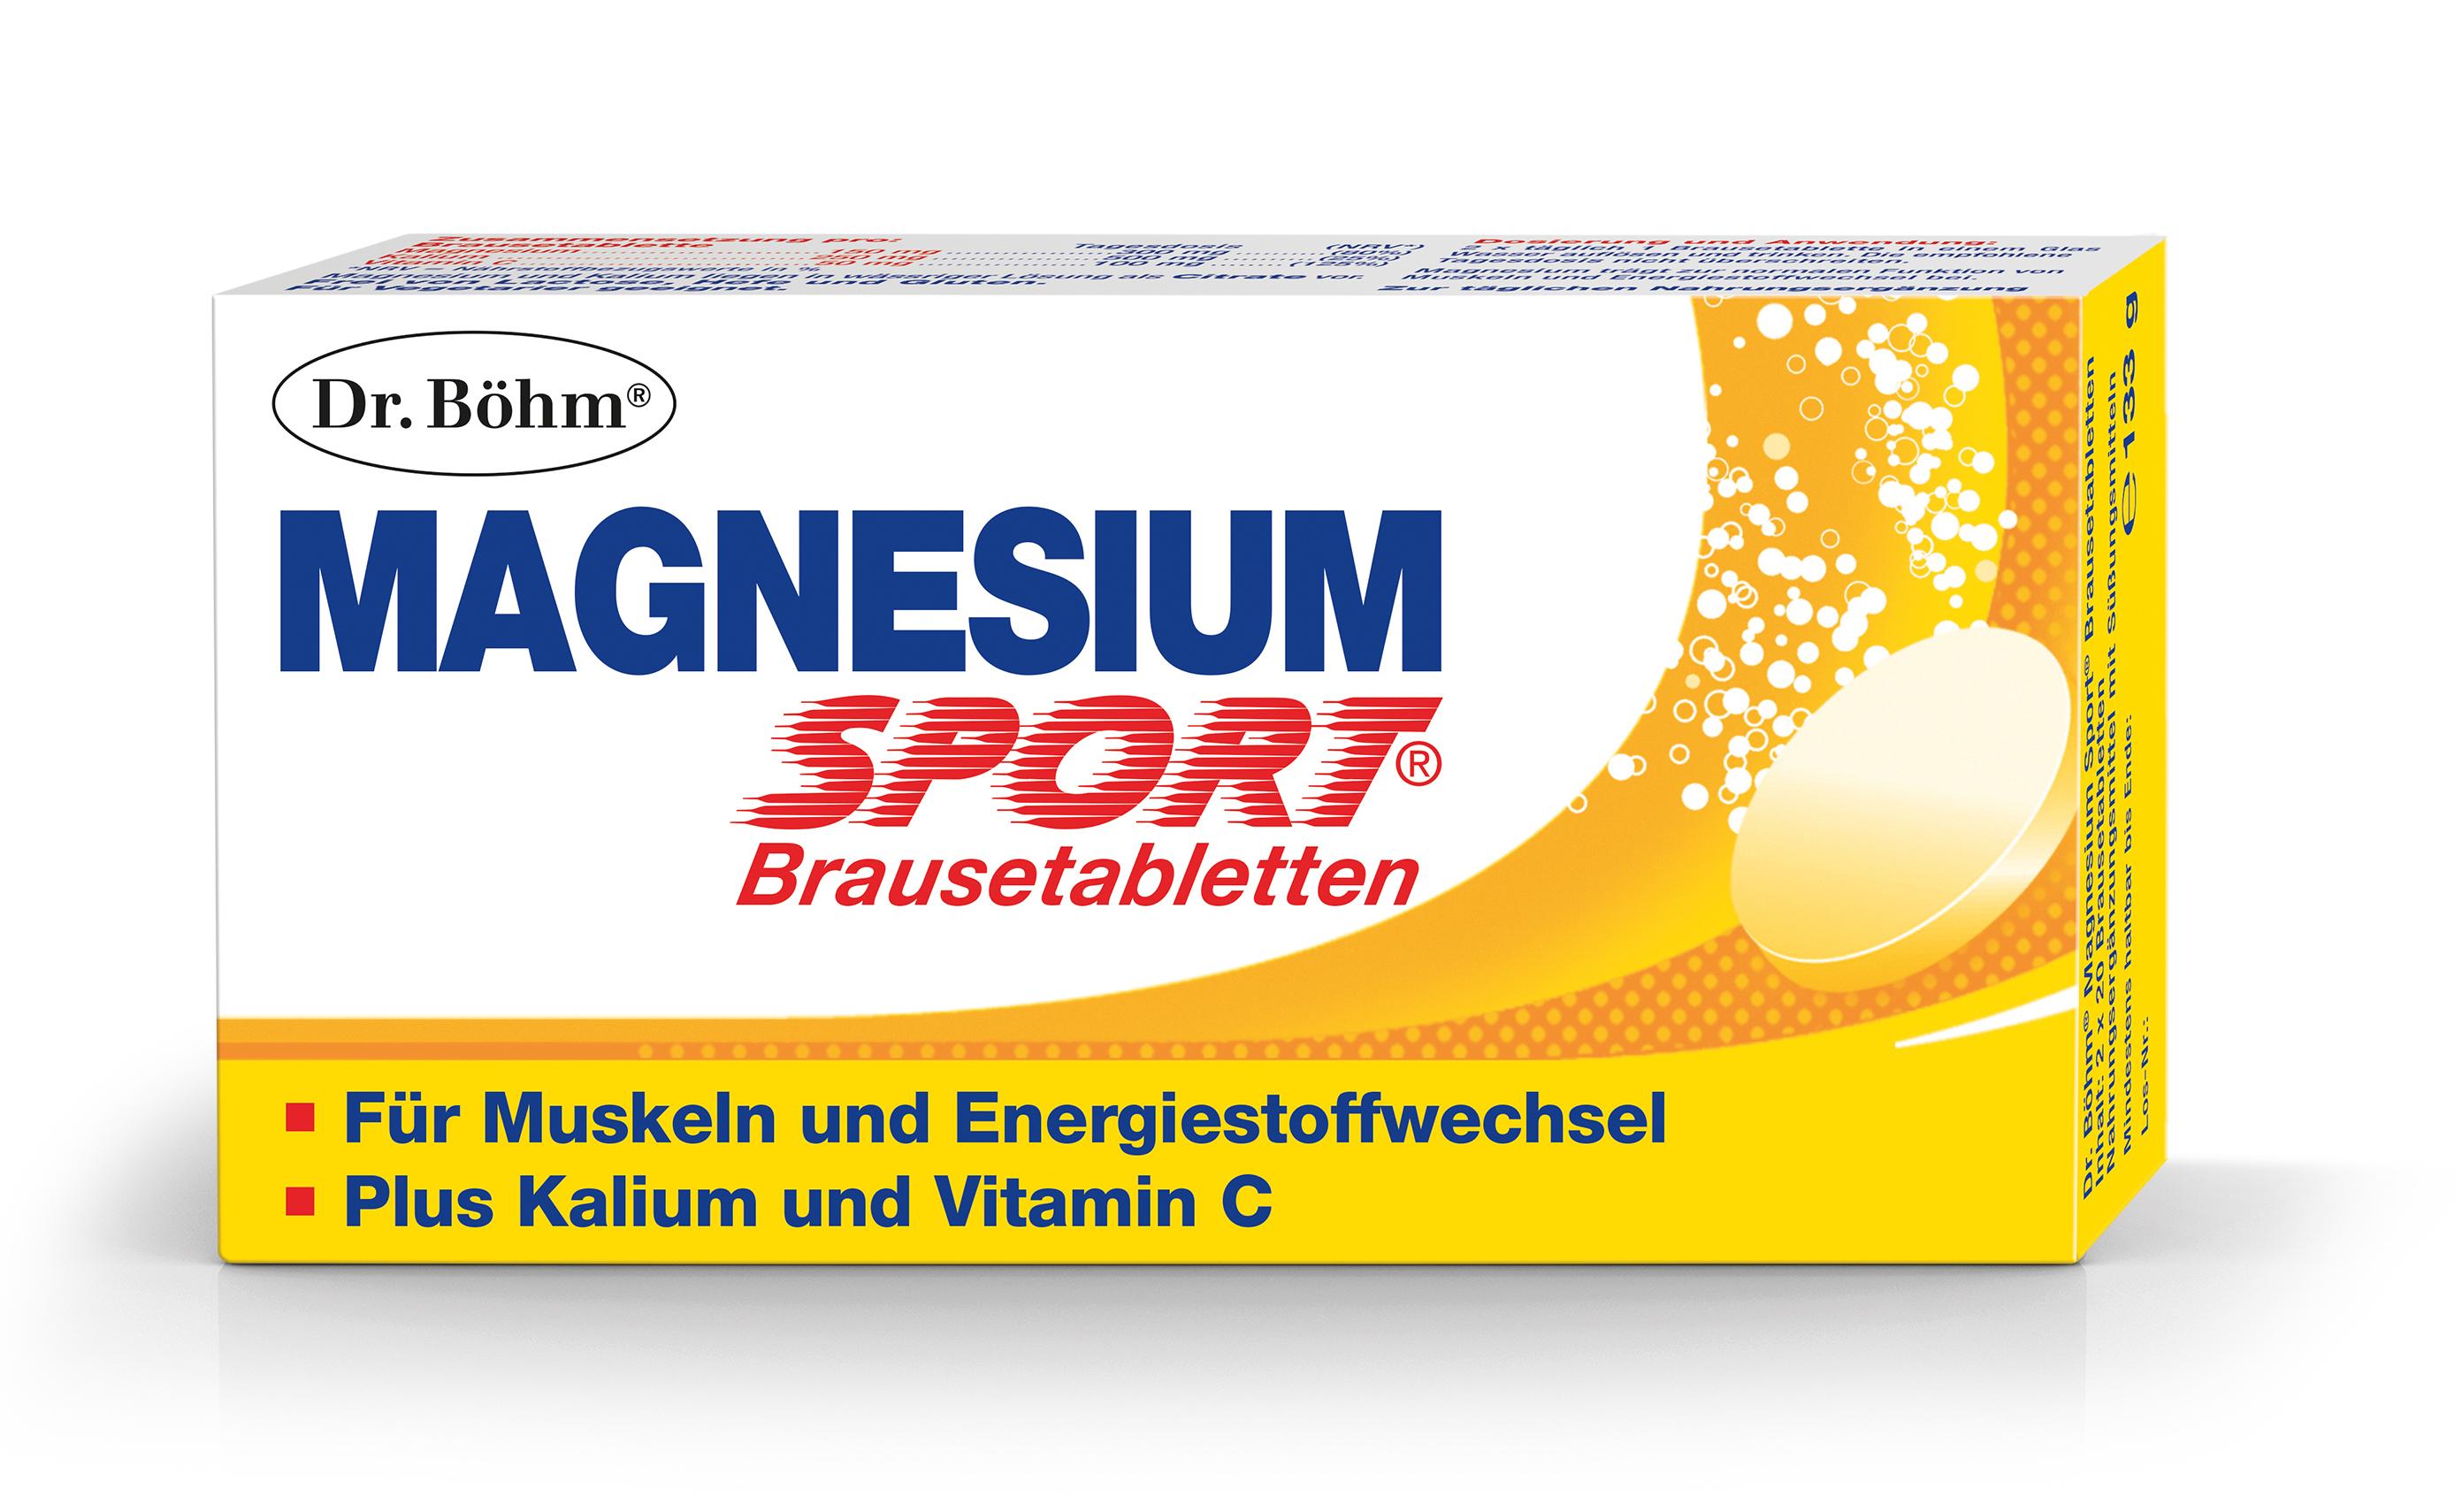 Magnesium Brausetabletten - Packung Dr. Böhm®